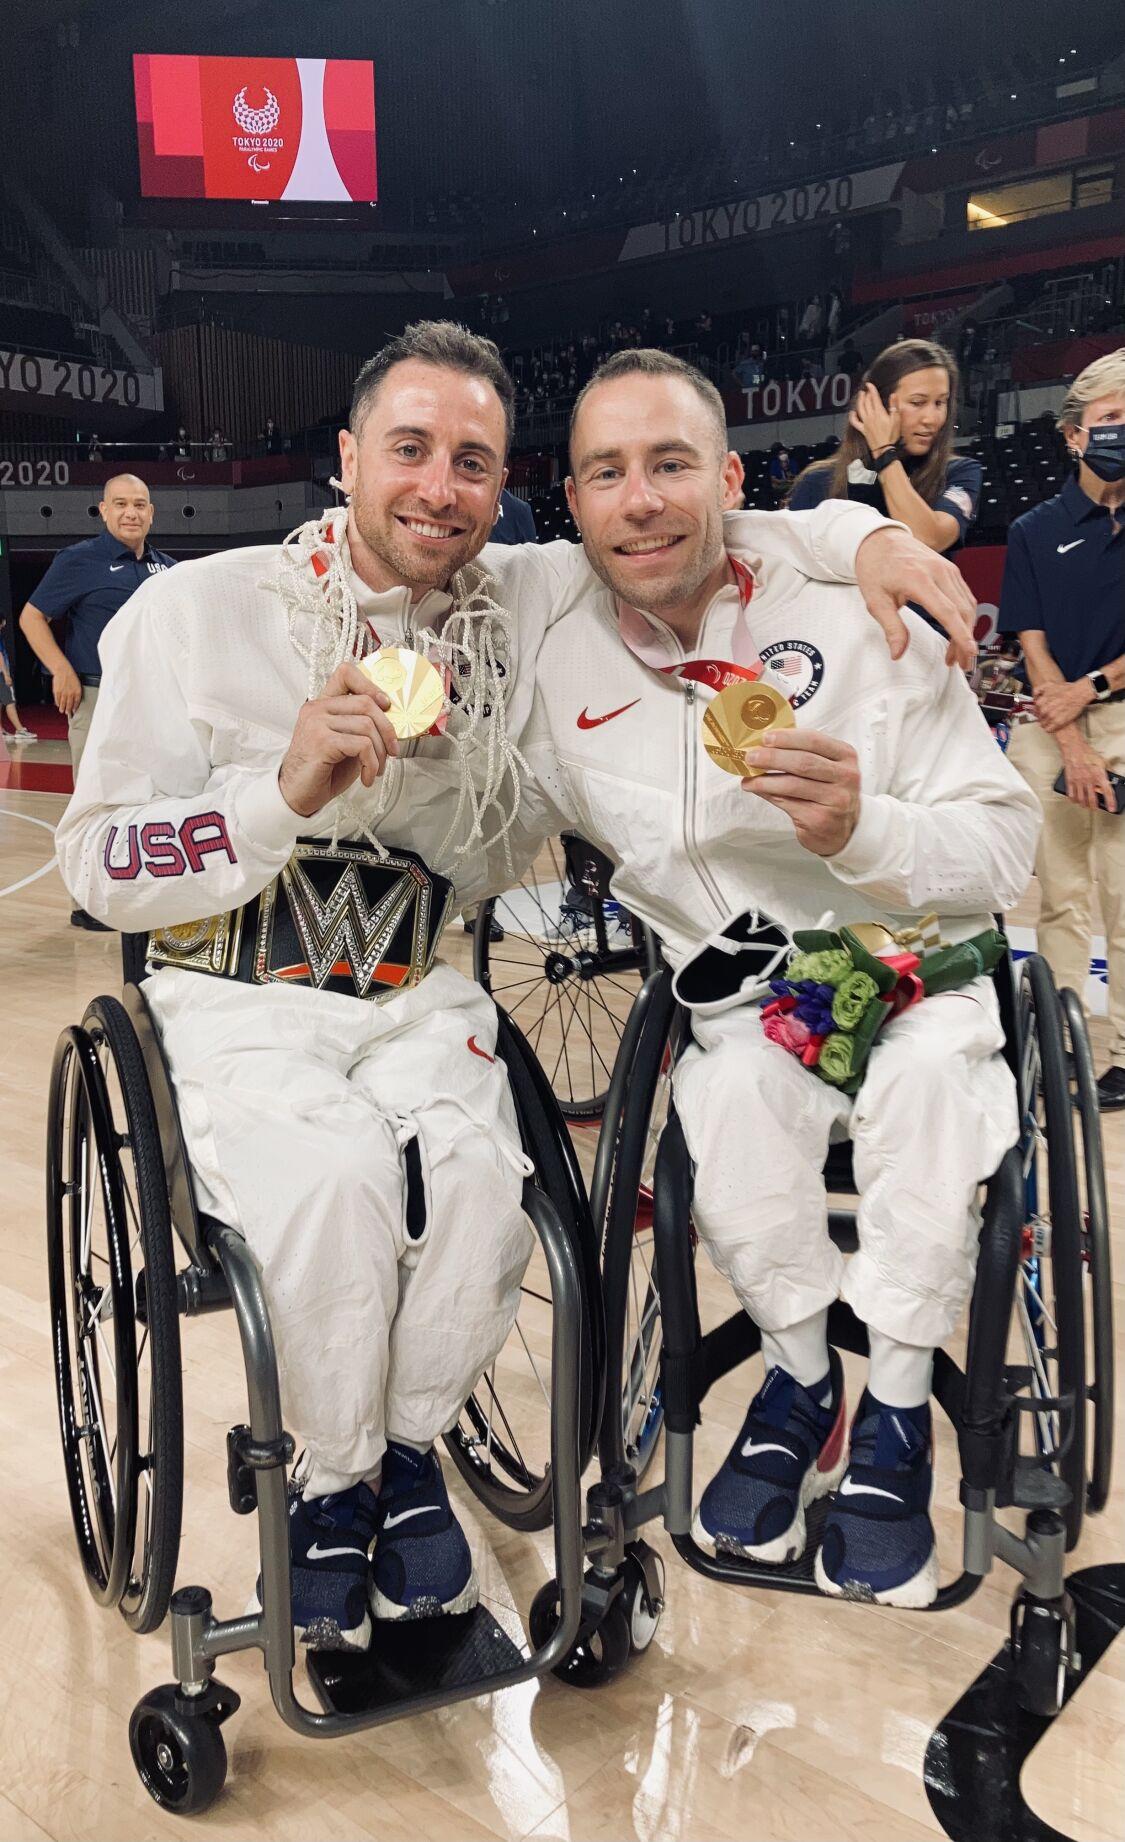 Steve Serio and Ryan Neiswender